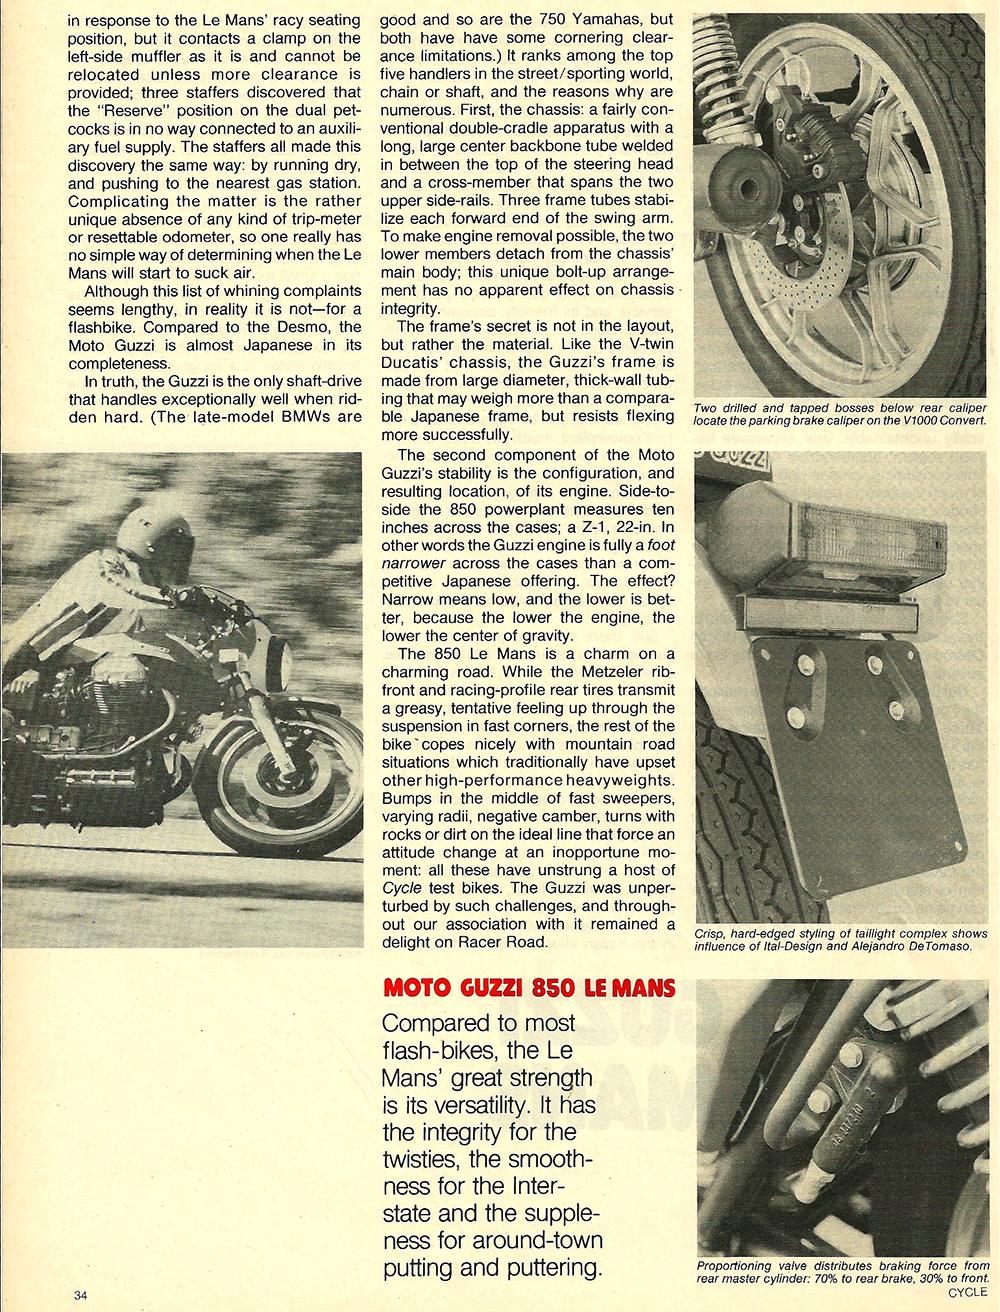 1977 Moto Guzzi 850 LeMans road test 03.jpg